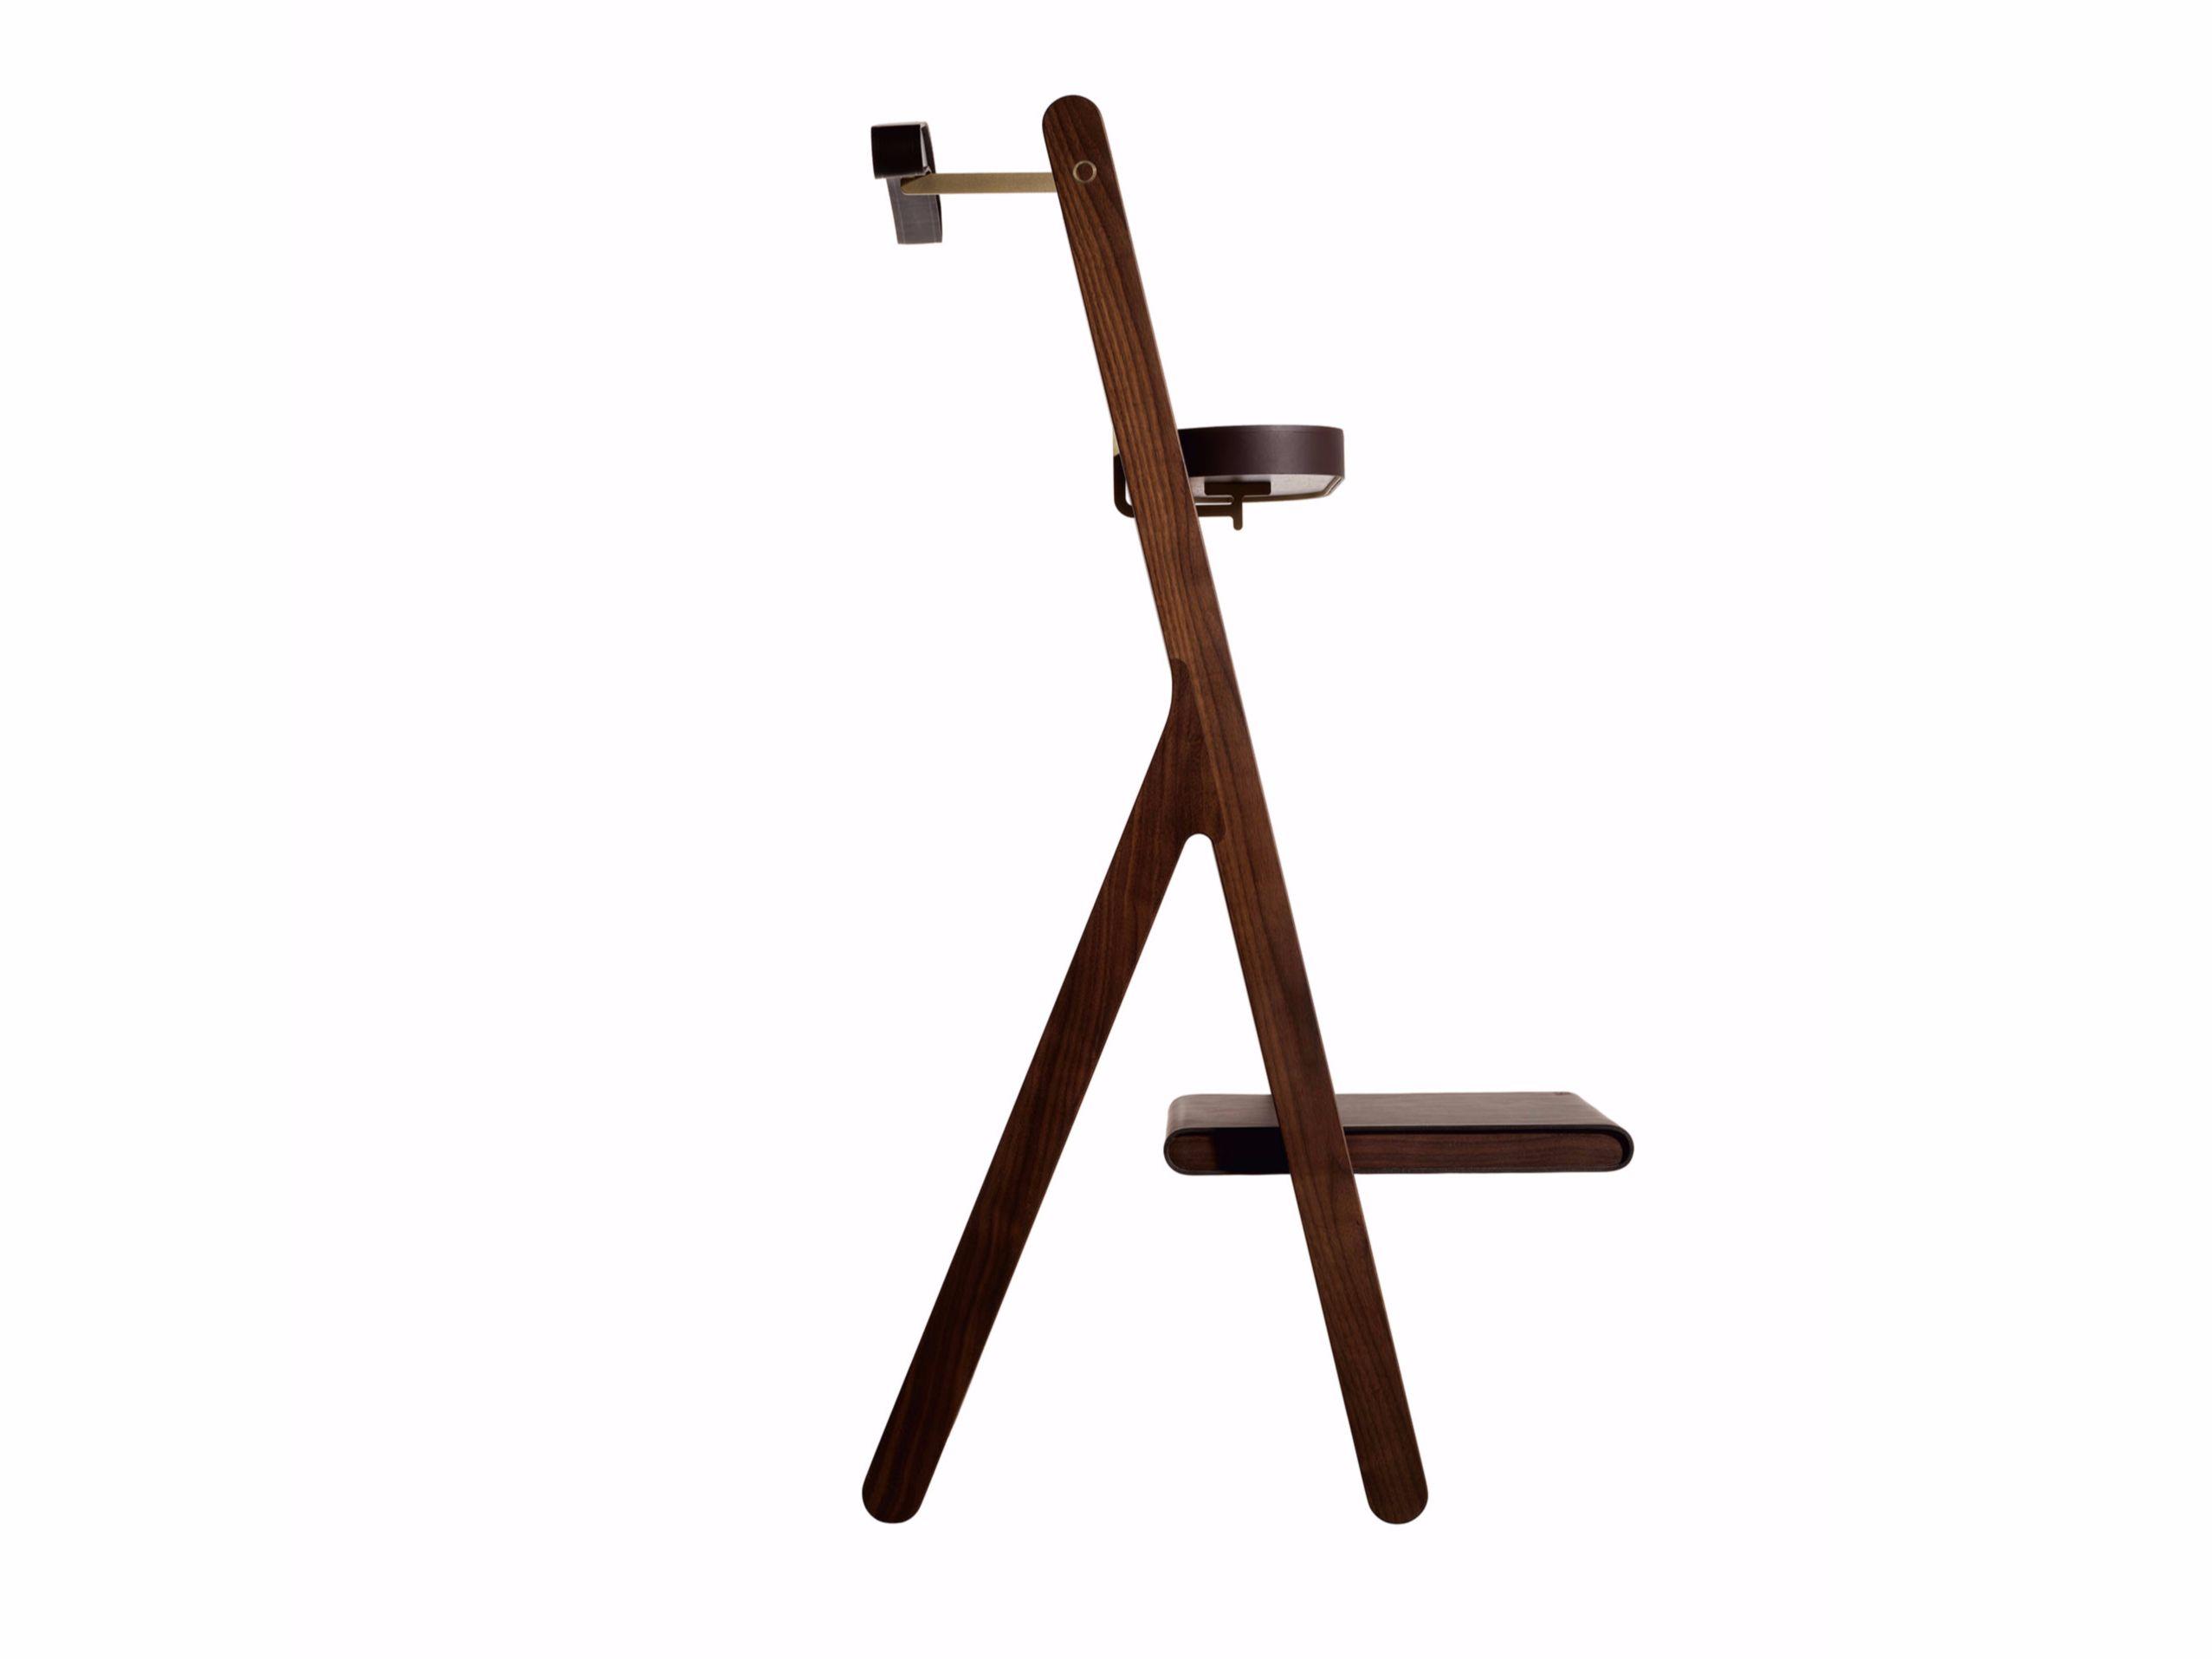 ren valet de nuit collection the collection furniture. Black Bedroom Furniture Sets. Home Design Ideas